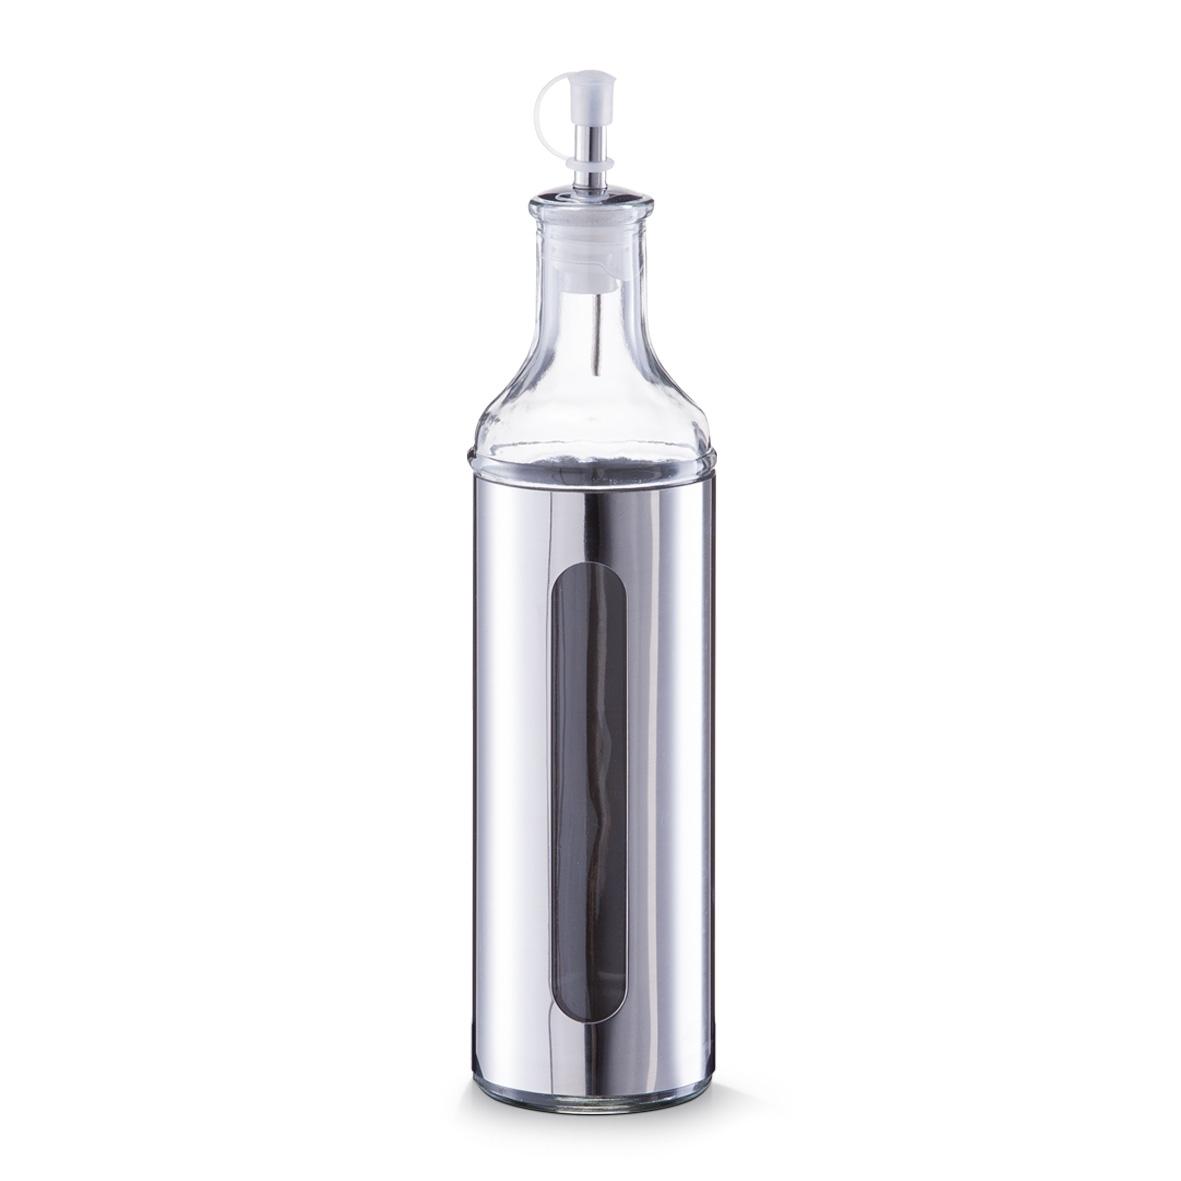 Sticla pentru ulei / otet Visual, inox si sticla, Silver 500 ml, Ø 6,5xH28 cm somproduct.ro